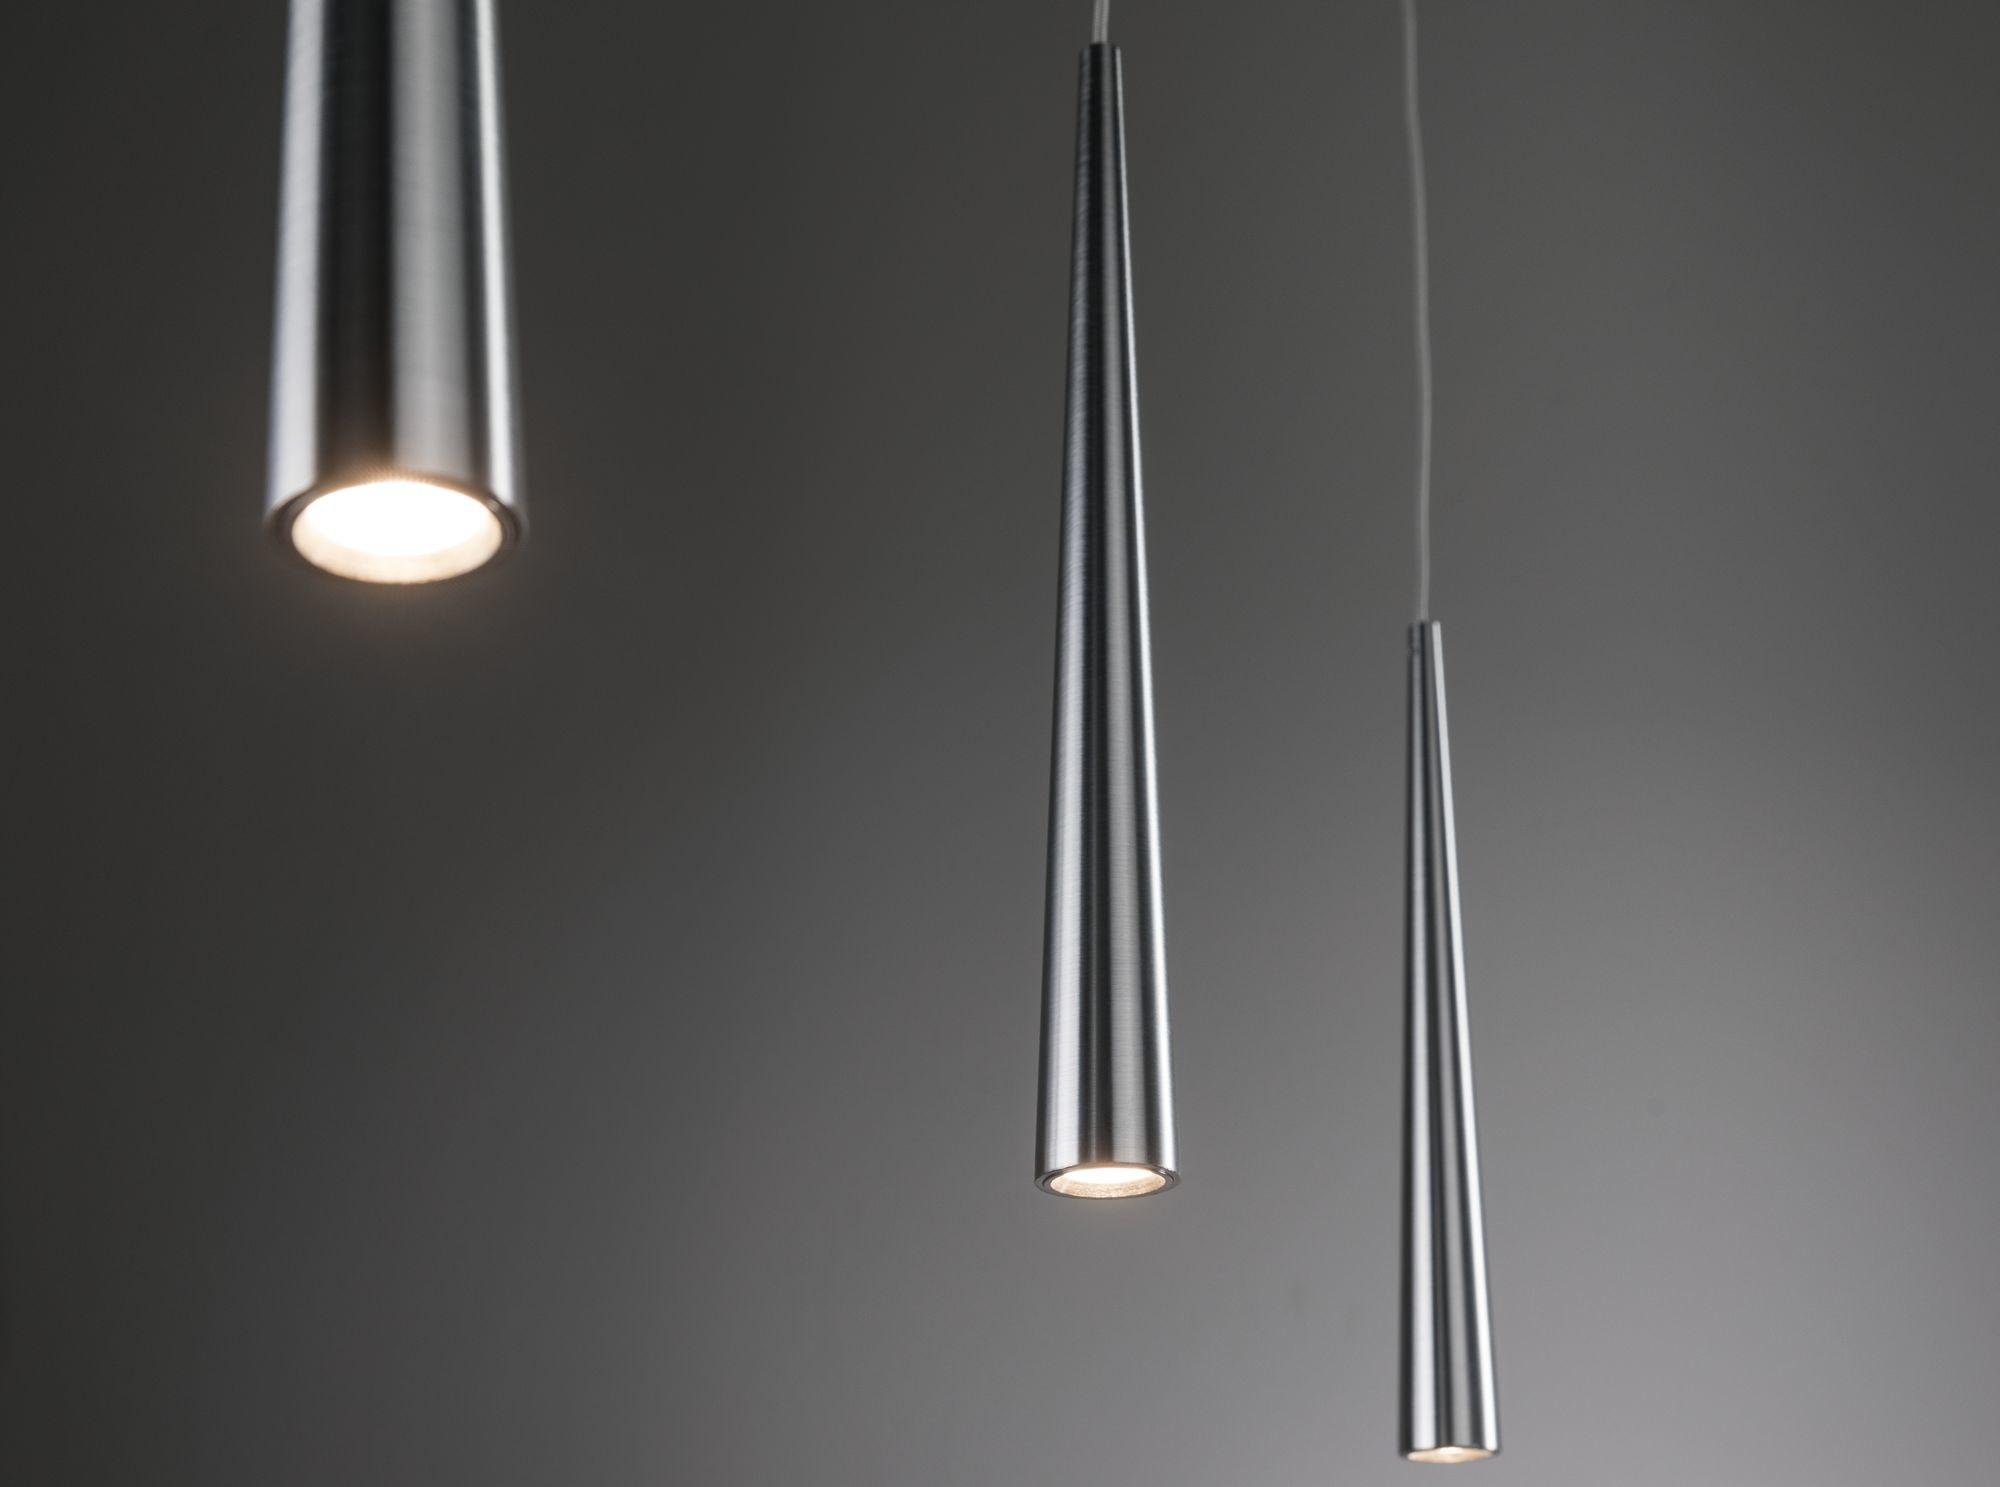 Paulmann LED Pendelleuchte Gutta 3-flammig 3x7W Alu gebürstet dimmbar